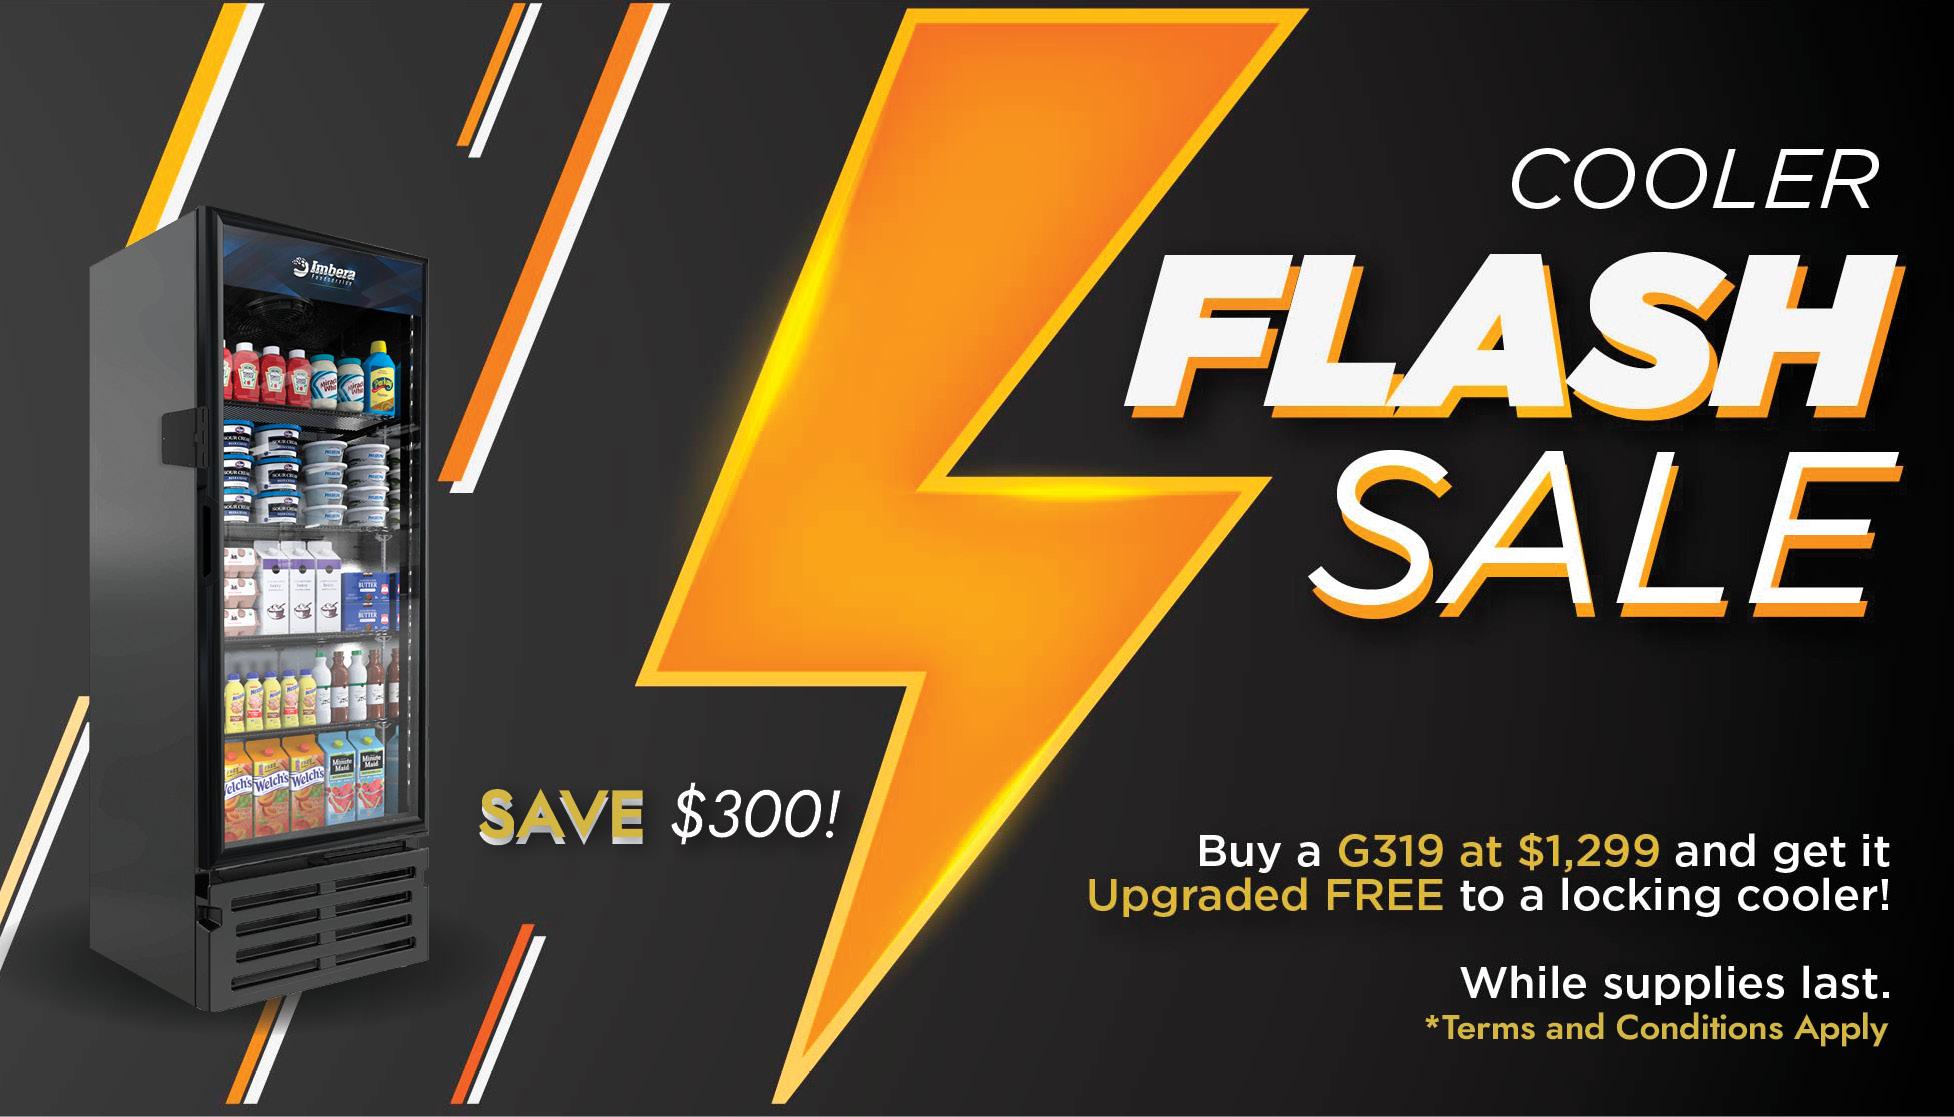 Cooler Flash Sale Special